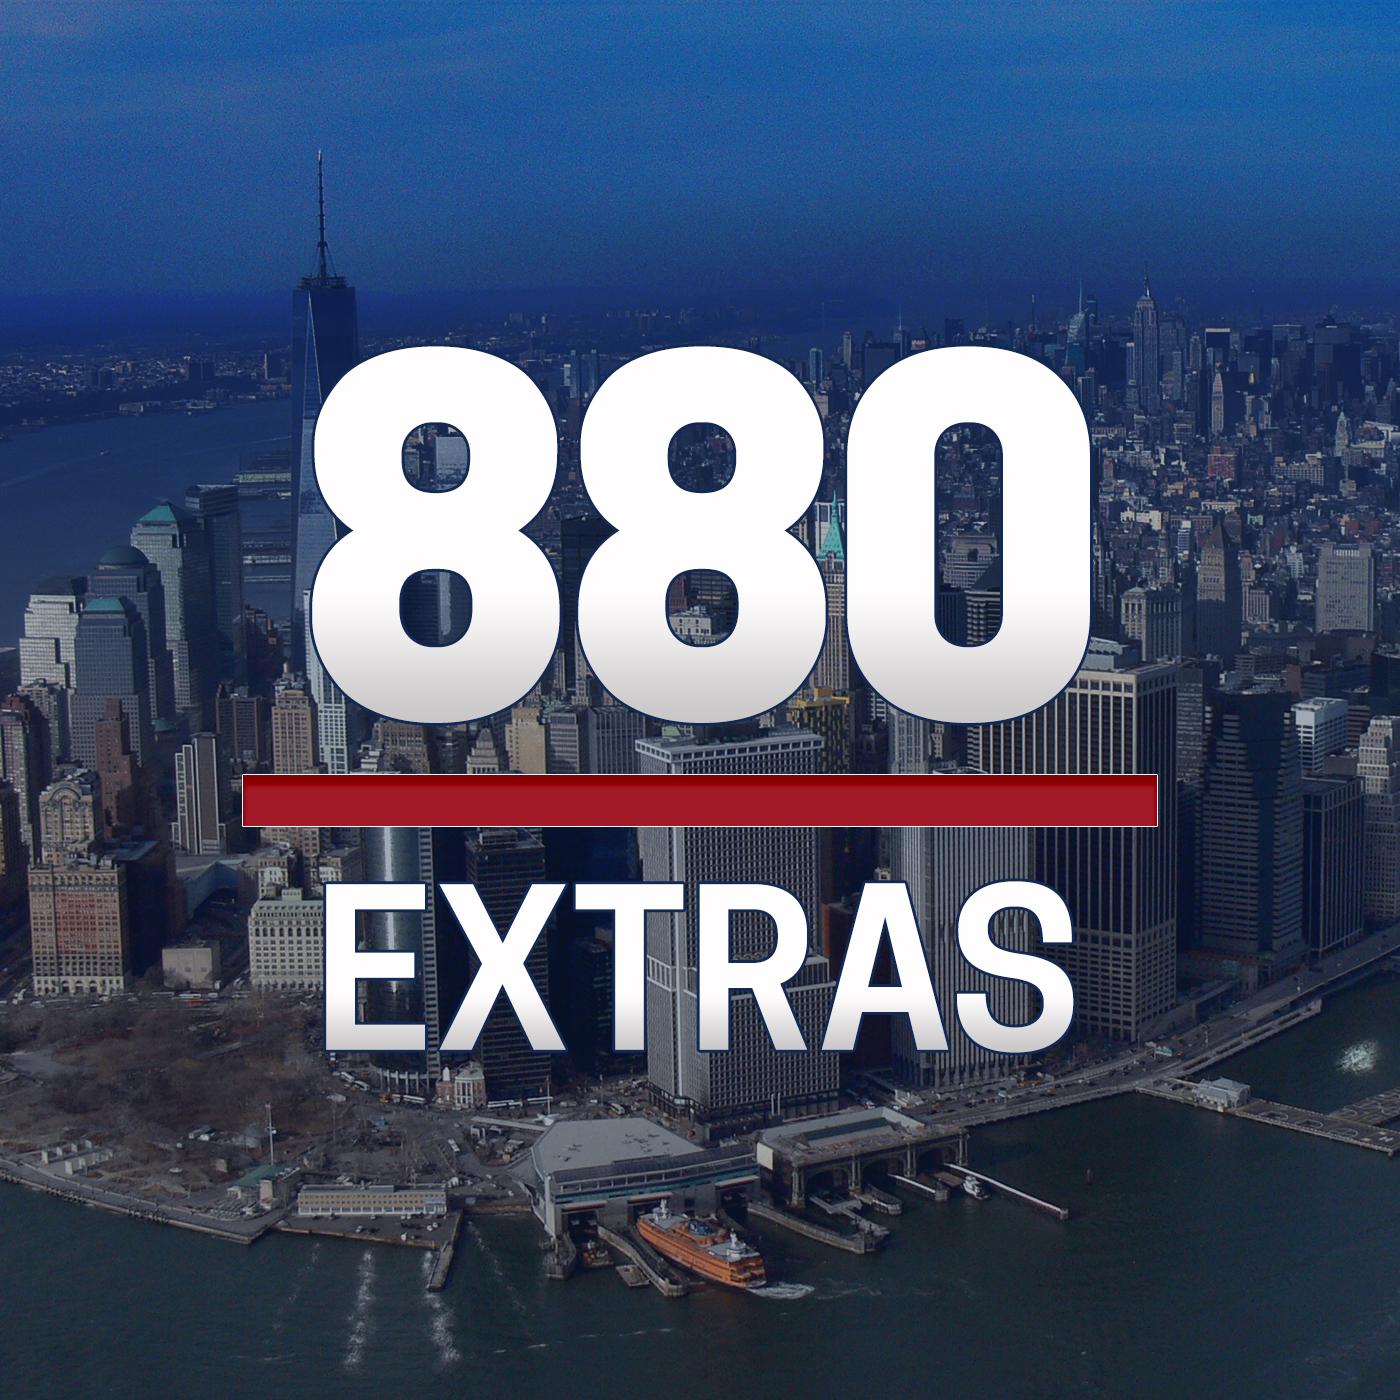 880 Extras